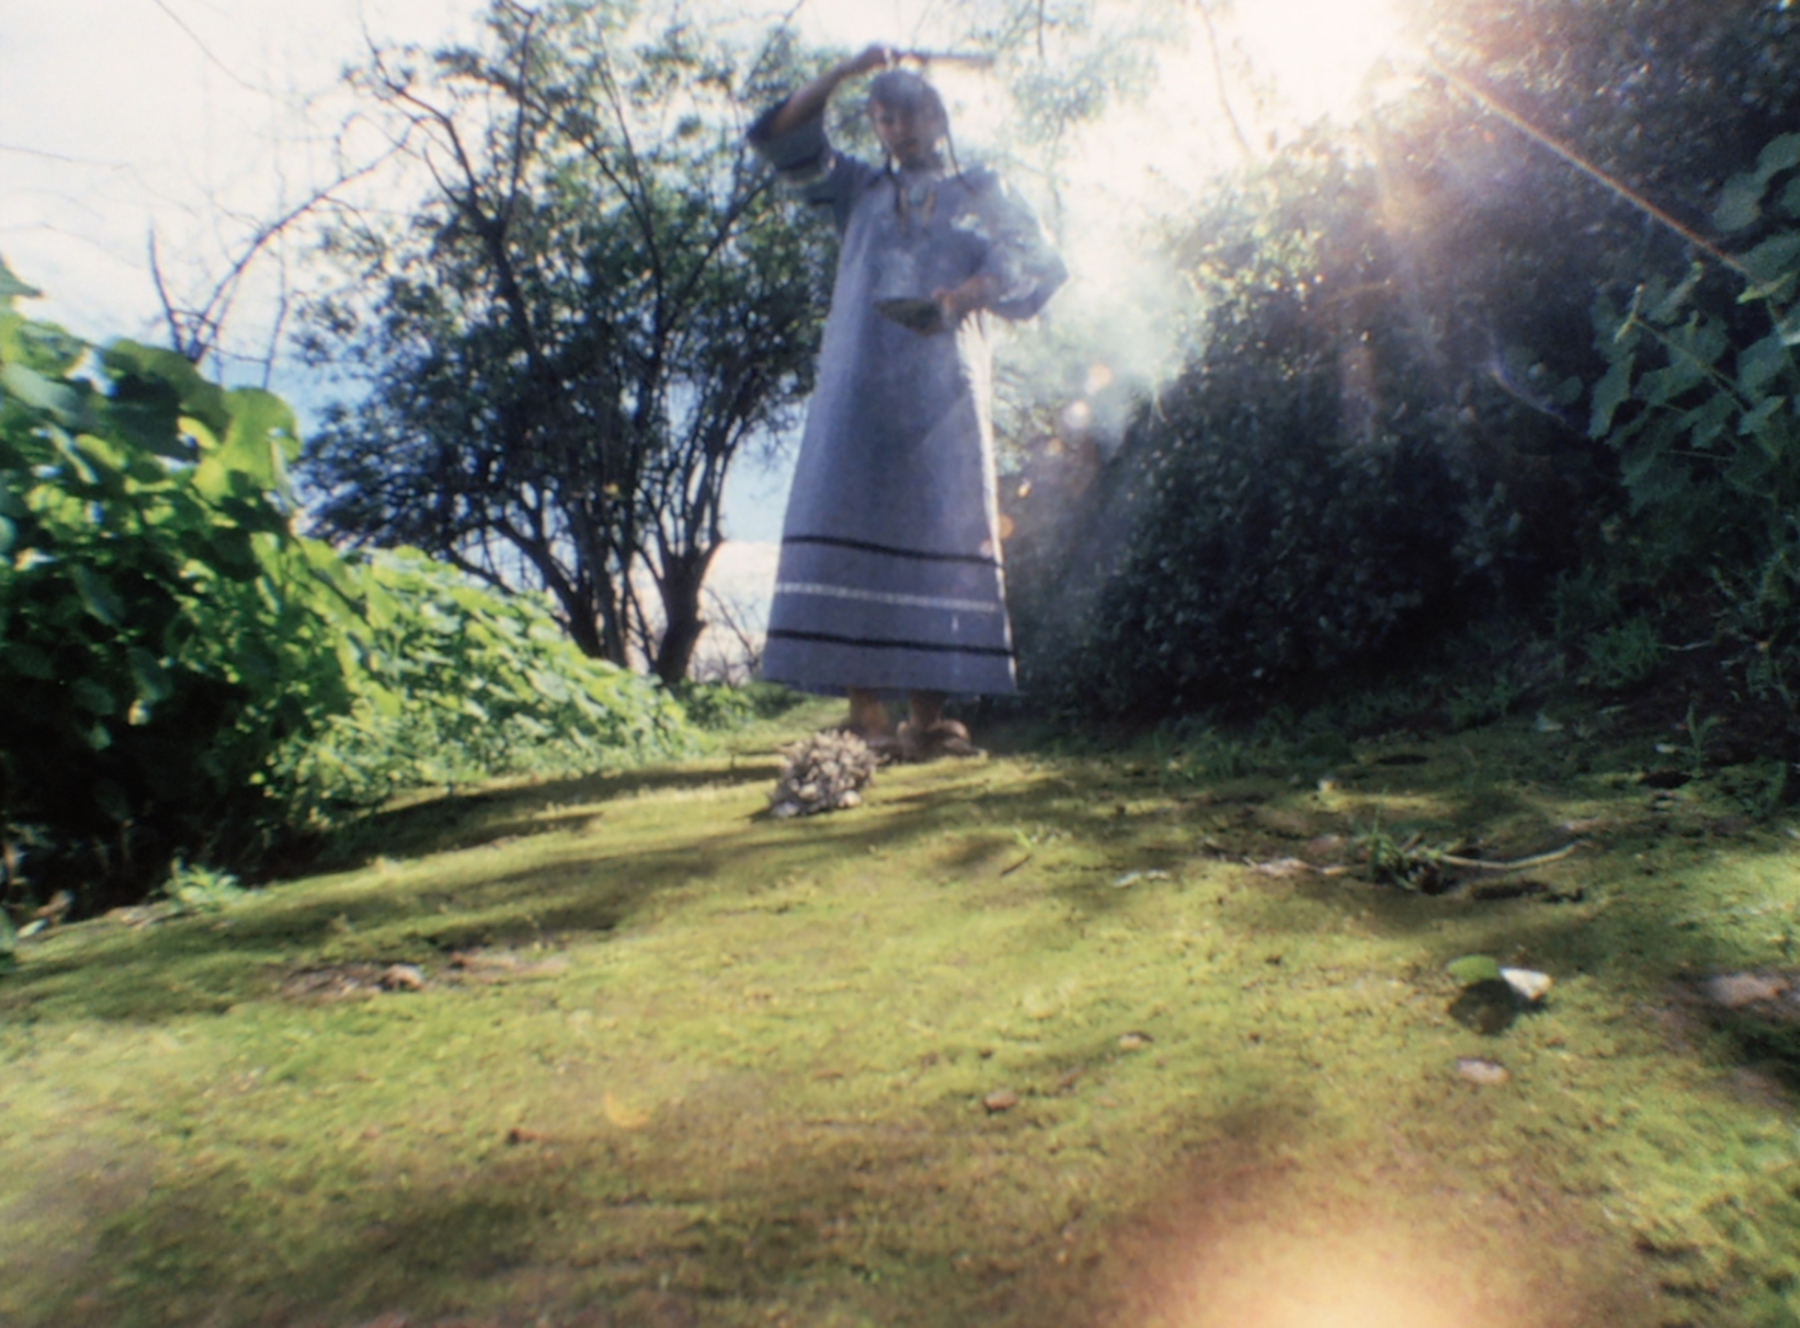 Eve-Lauryn LaFountain,  Smudge series , video, 7min 13sec, 2014